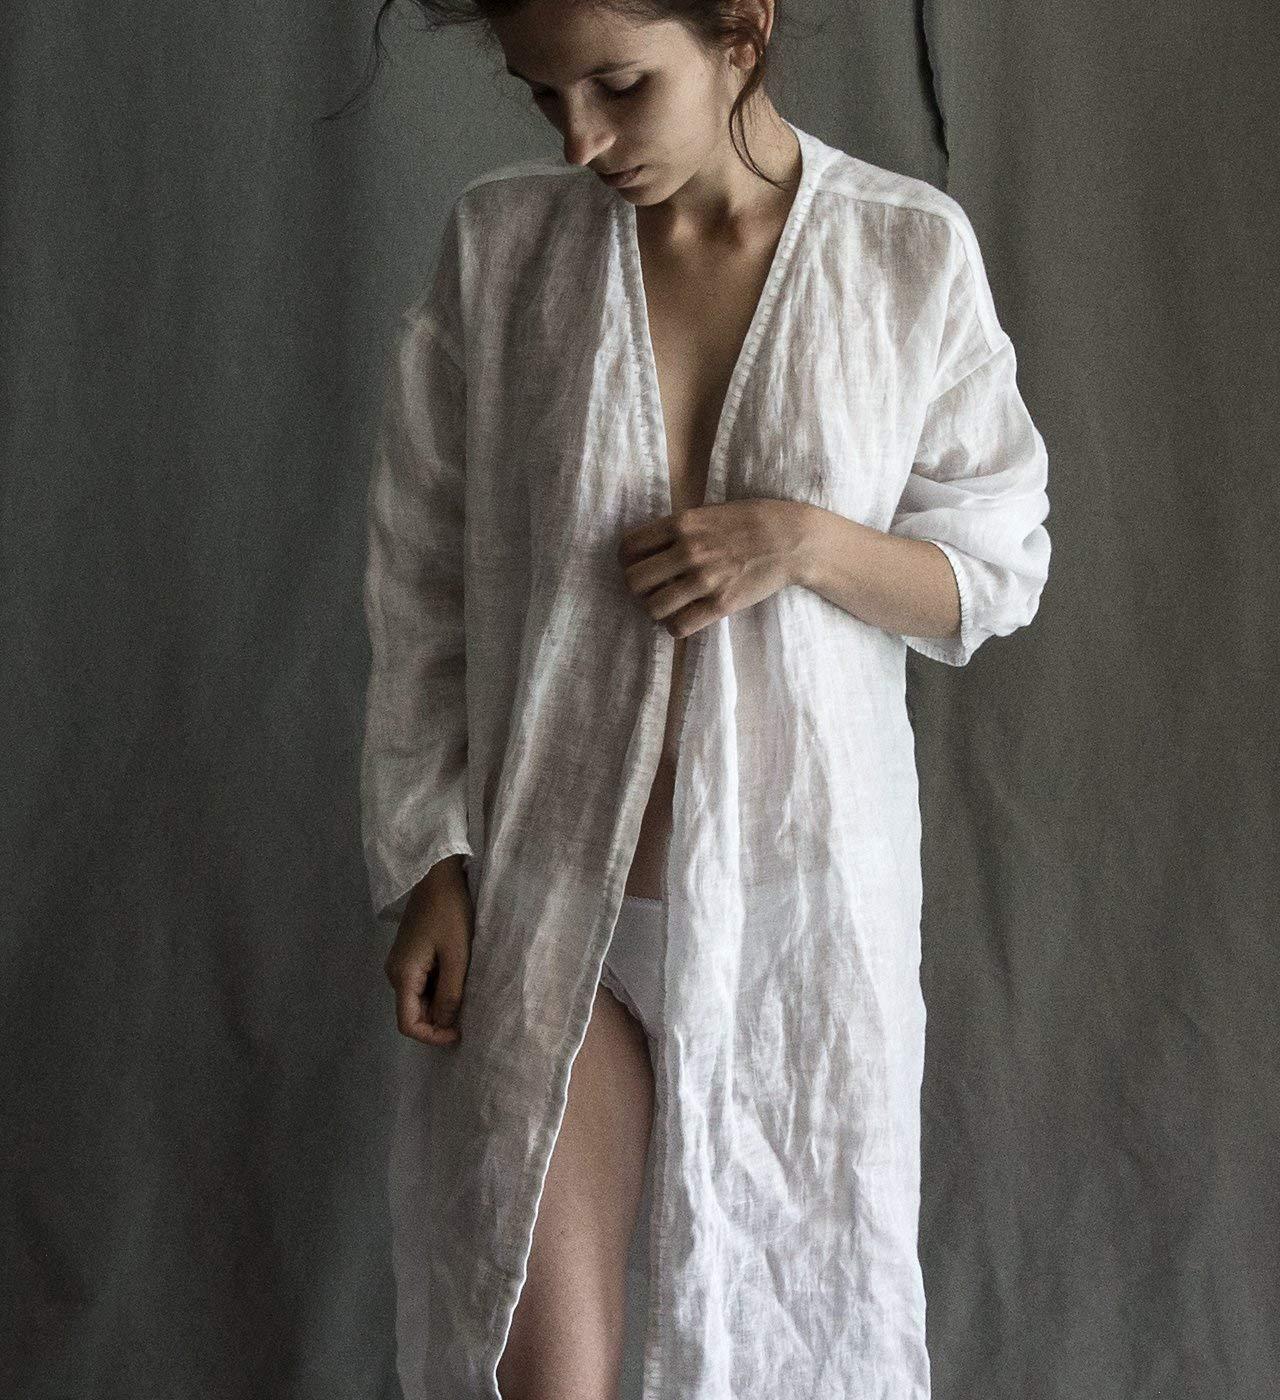 ab37338e3c3 Linen robe linen gauze robe linen pyjama linen home wear linen suit lounge wear  linen women s